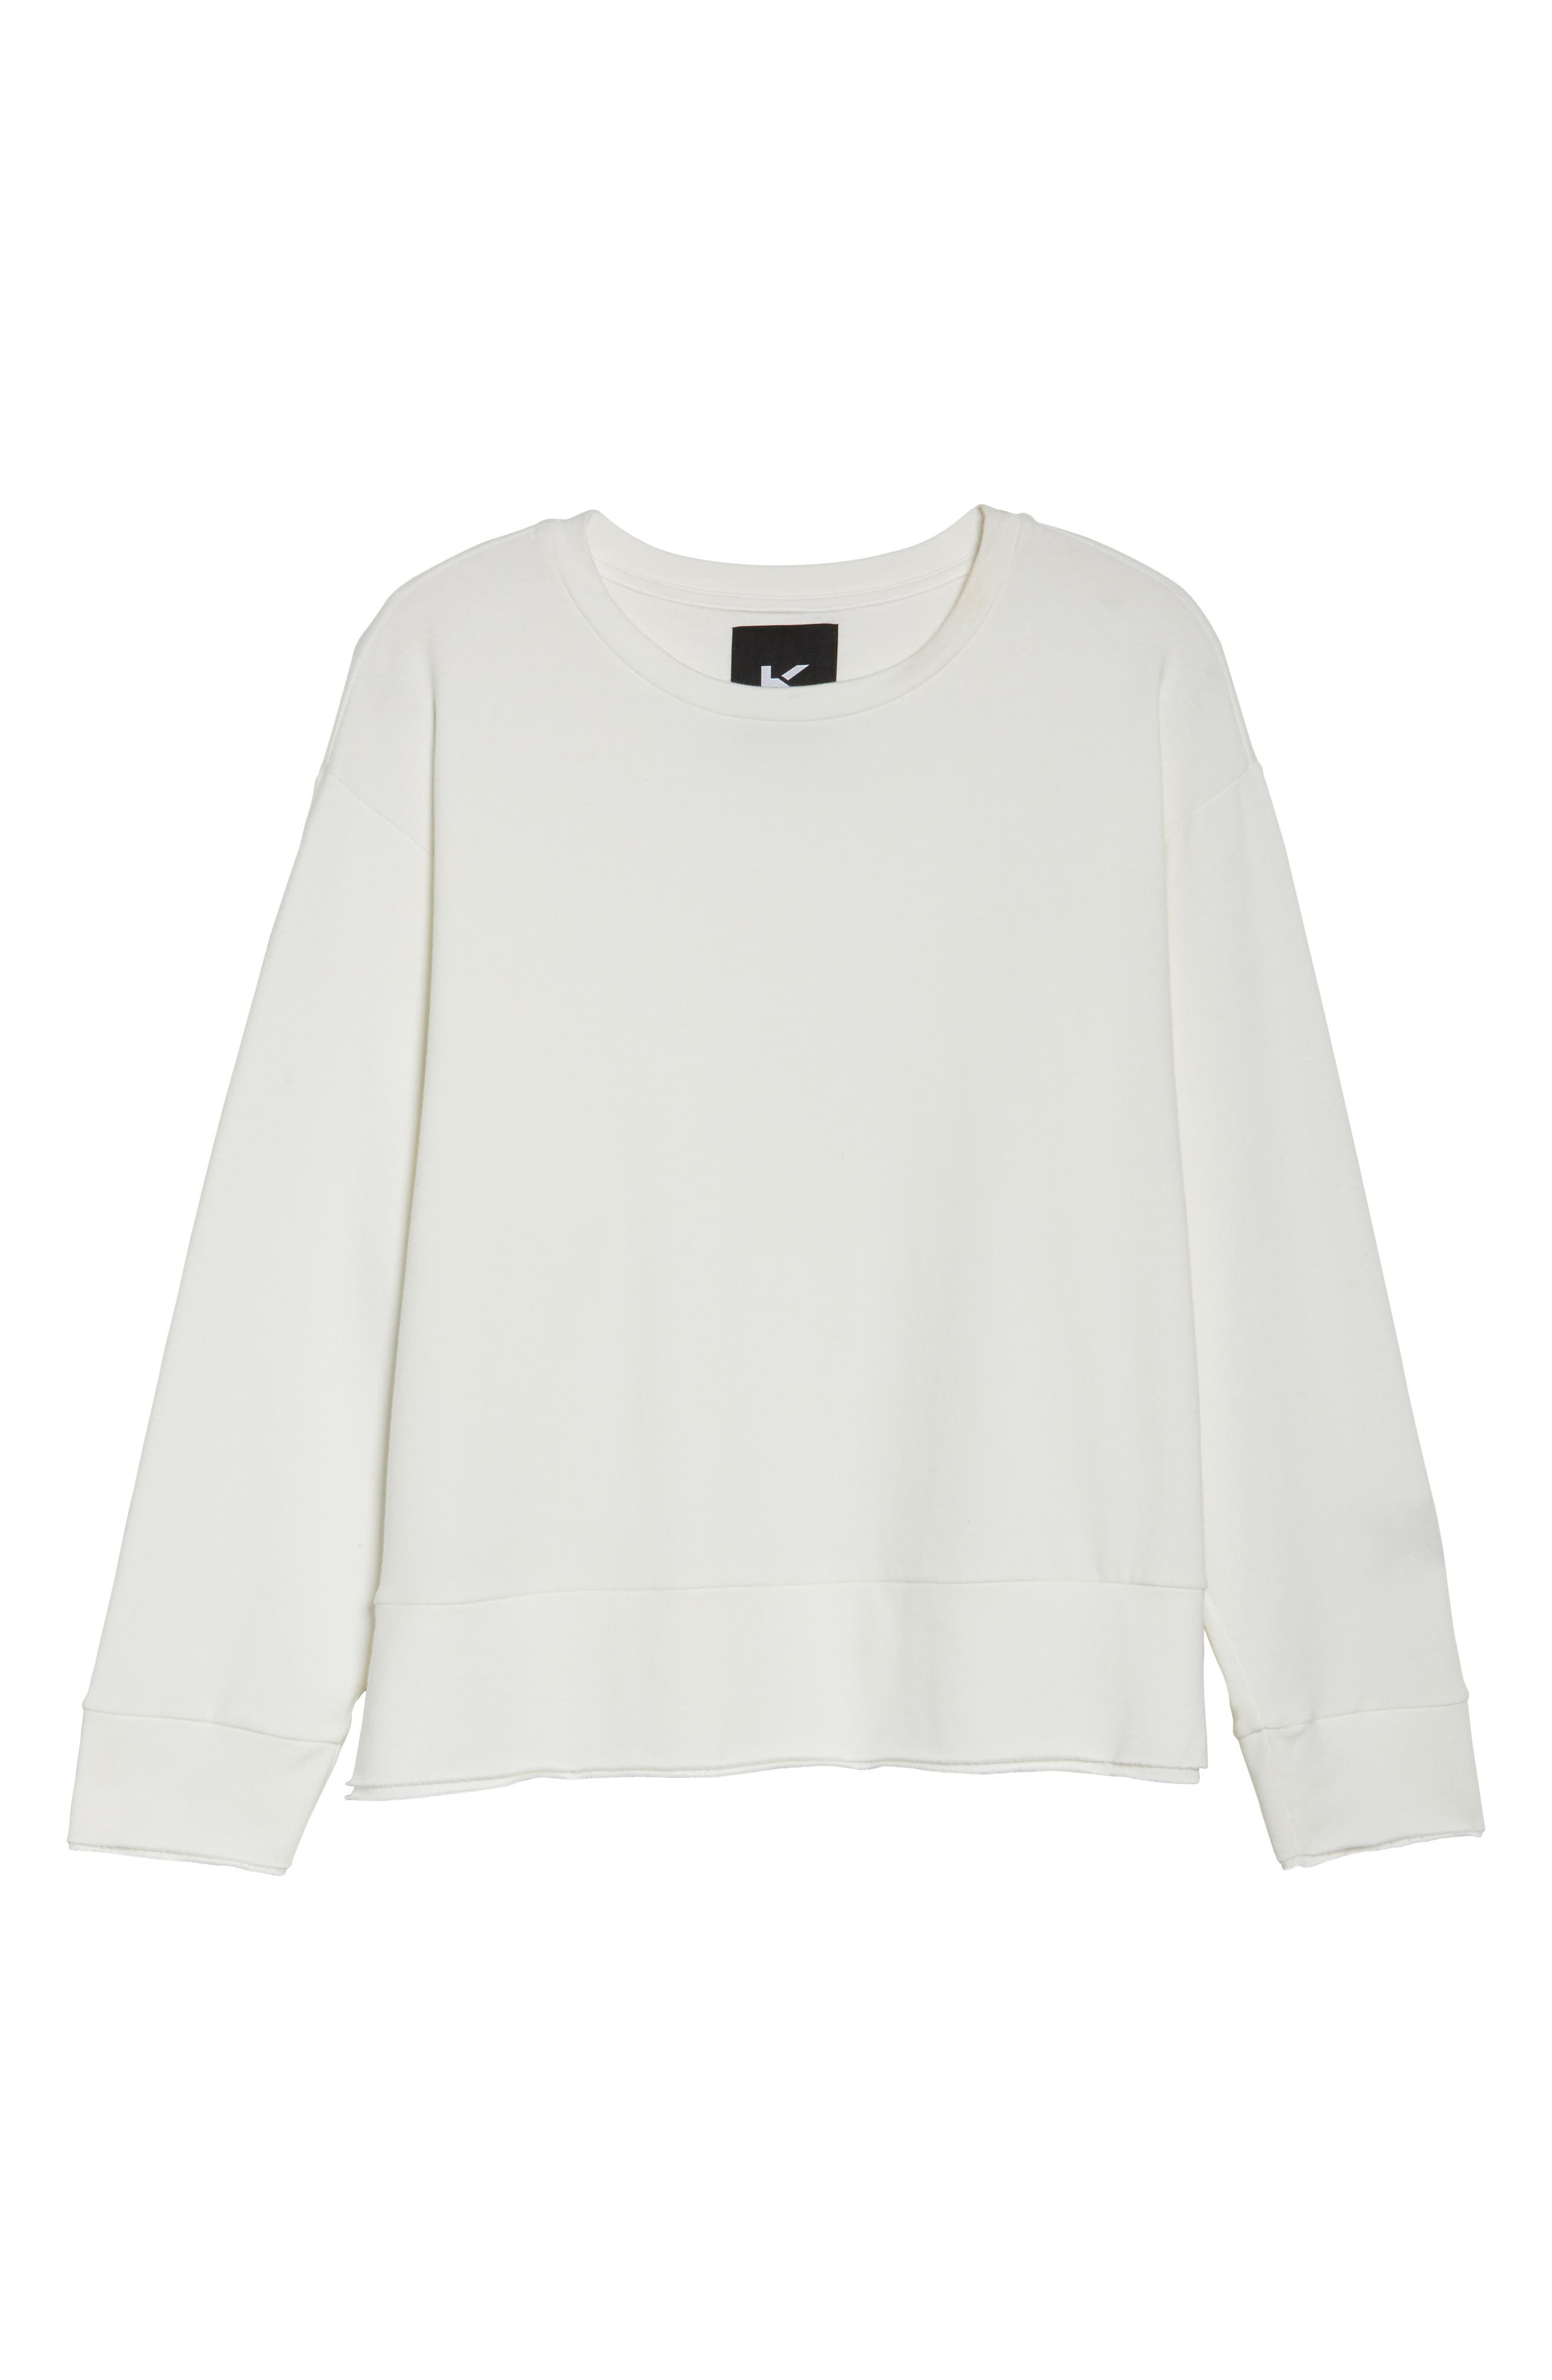 Global Sweatshirt,                             Alternate thumbnail 12, color,